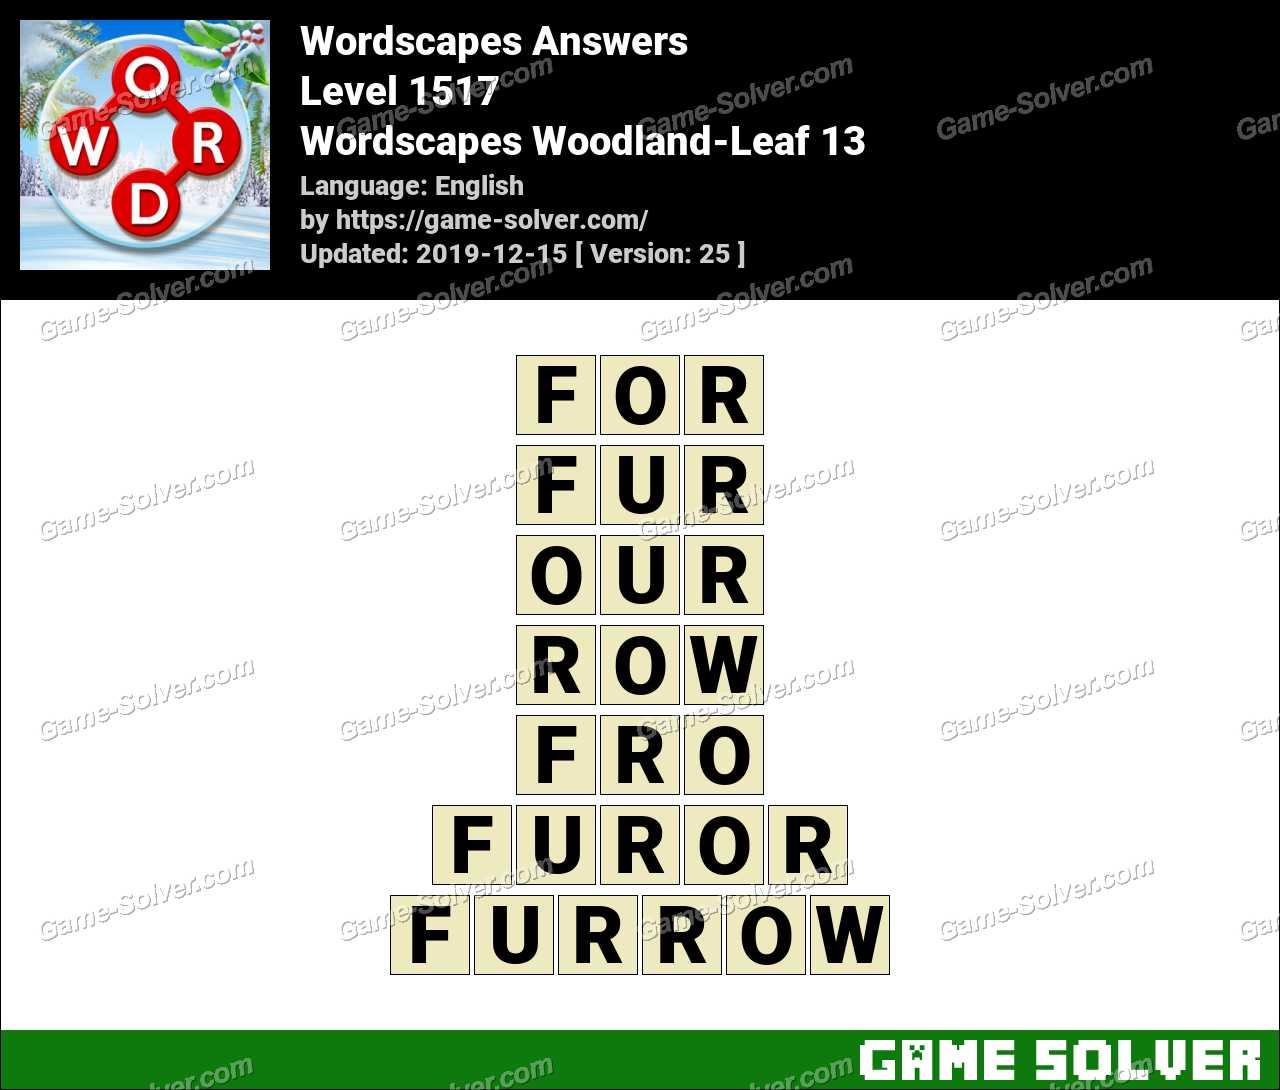 Wordscapes Woodland-Leaf 13 Answers